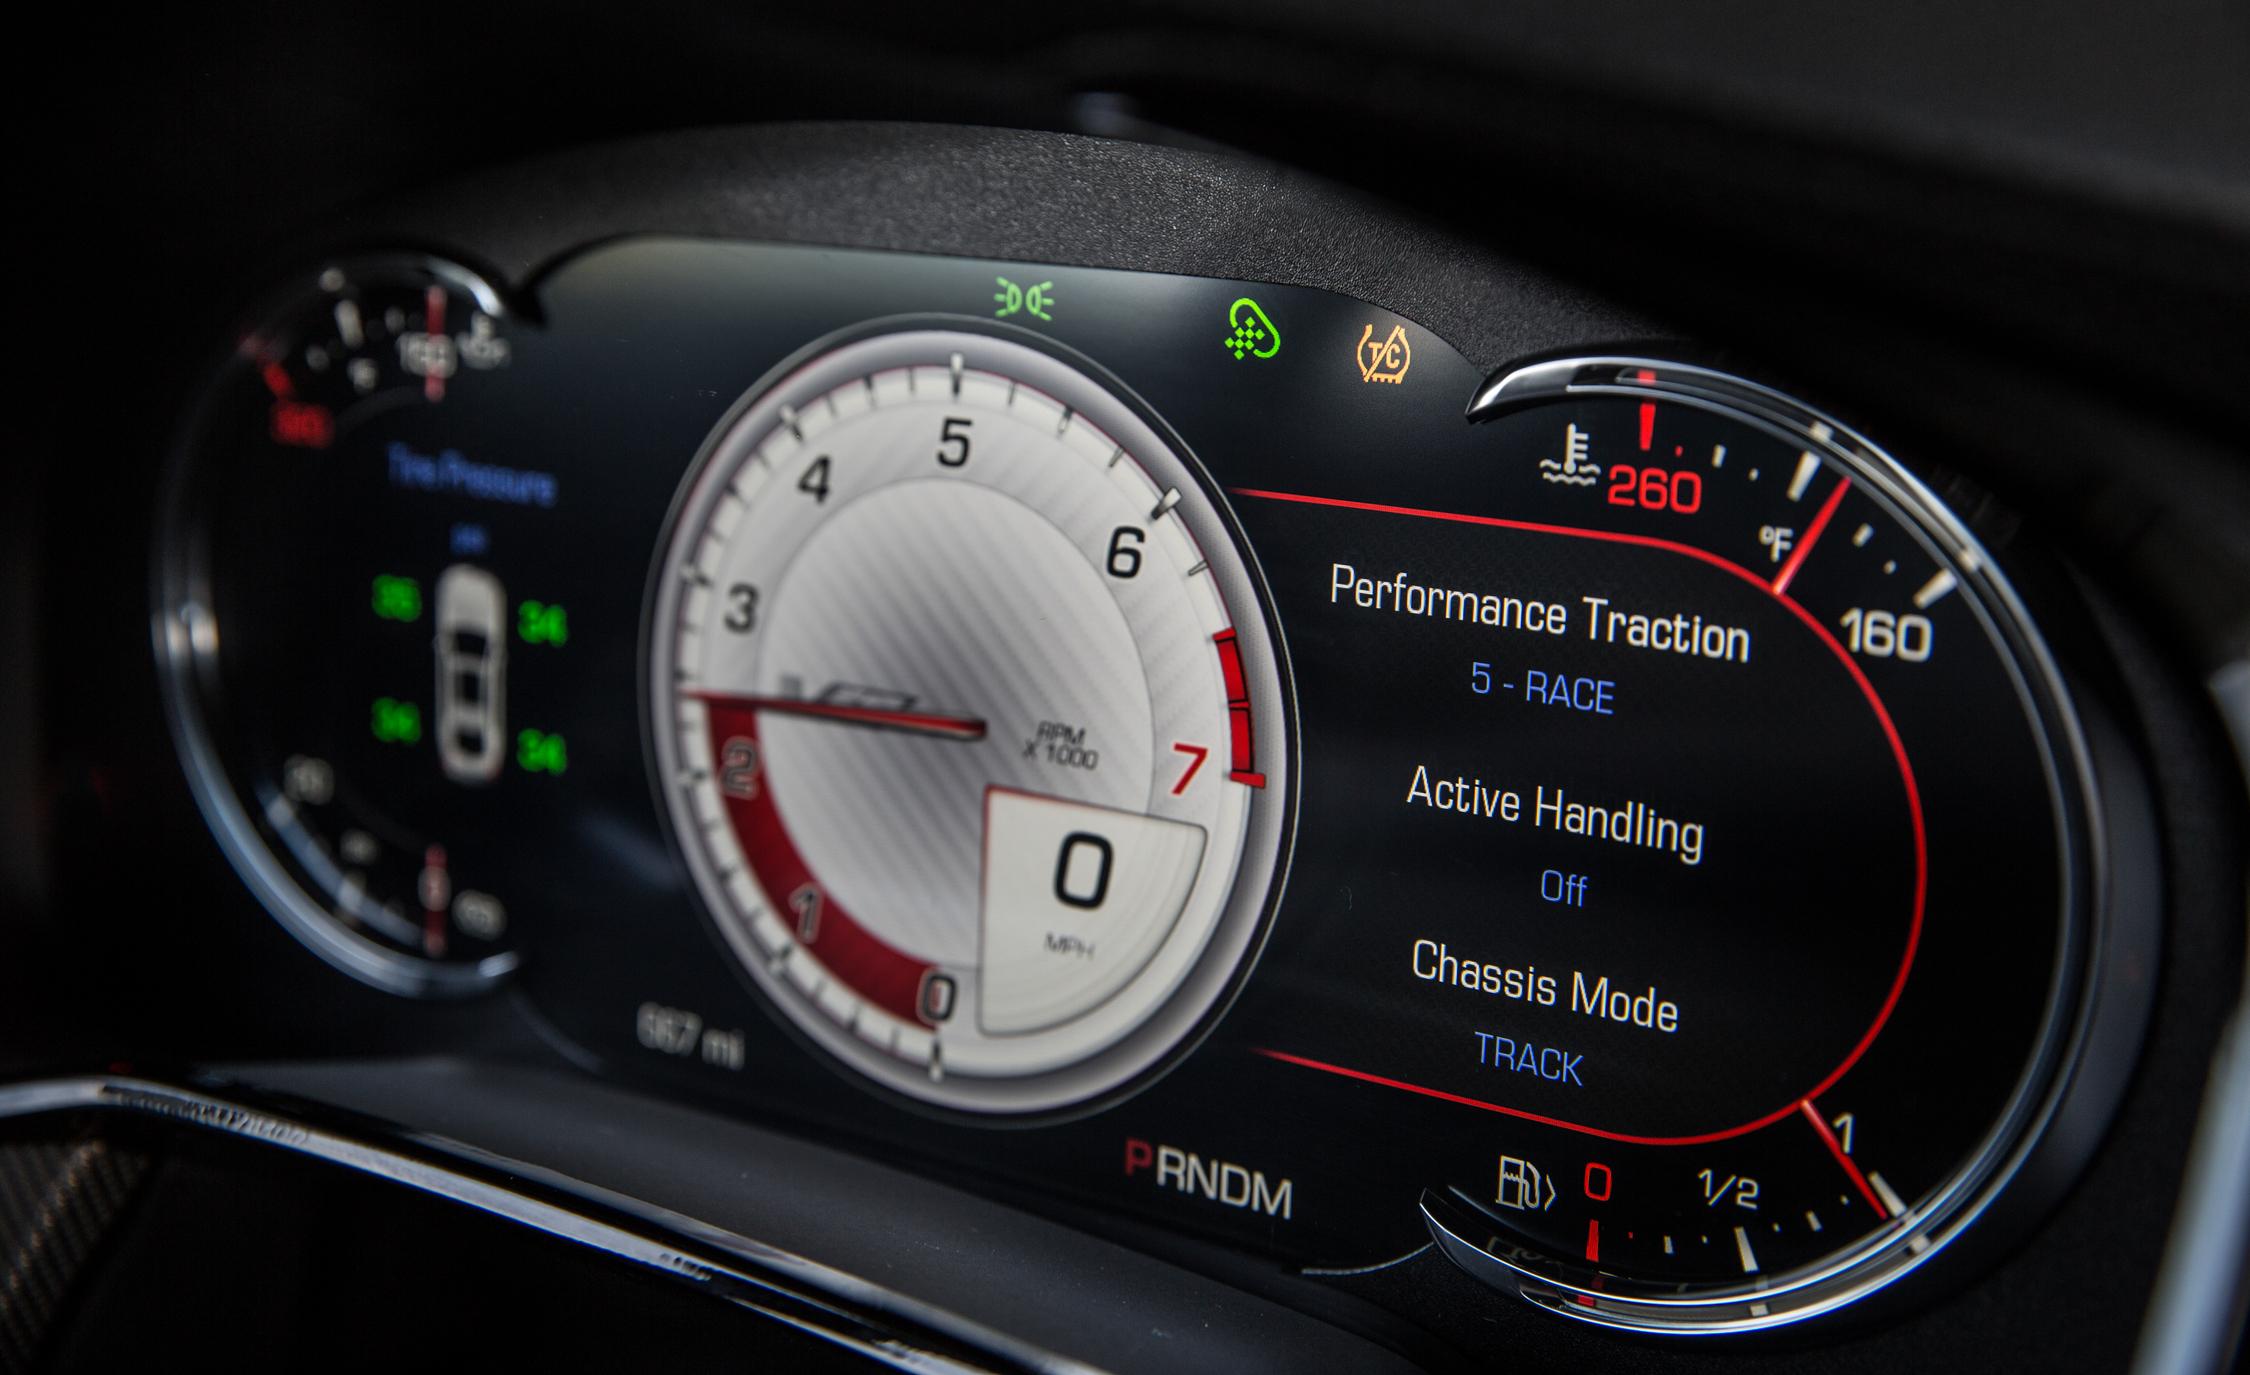 2016 Cadillac CTS-V Interior Speedometer